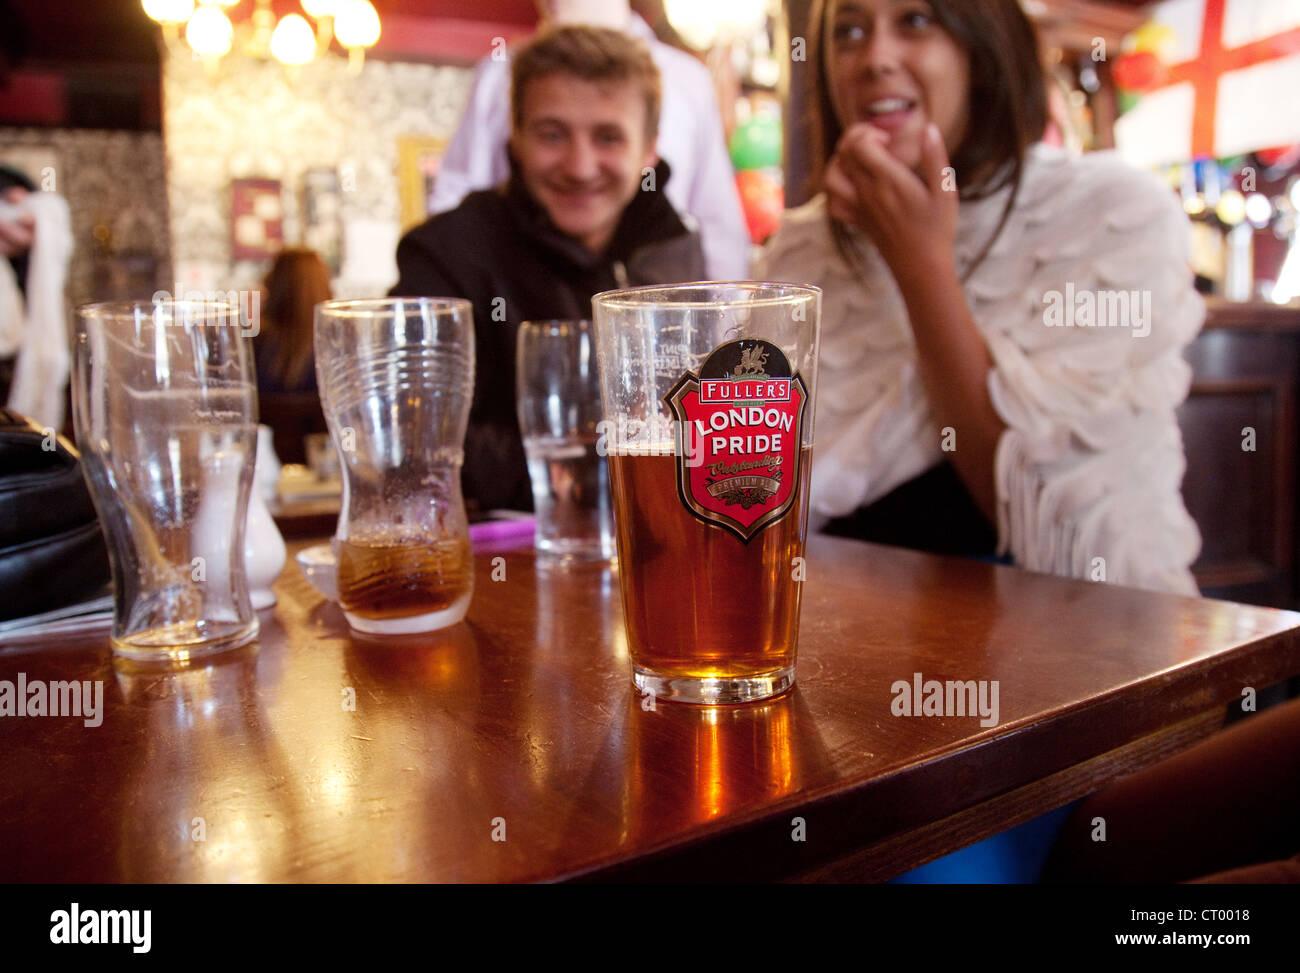 People drinking Fullers London Pride beer in the Duke of York pub, Victoria, London UK Stock Photo